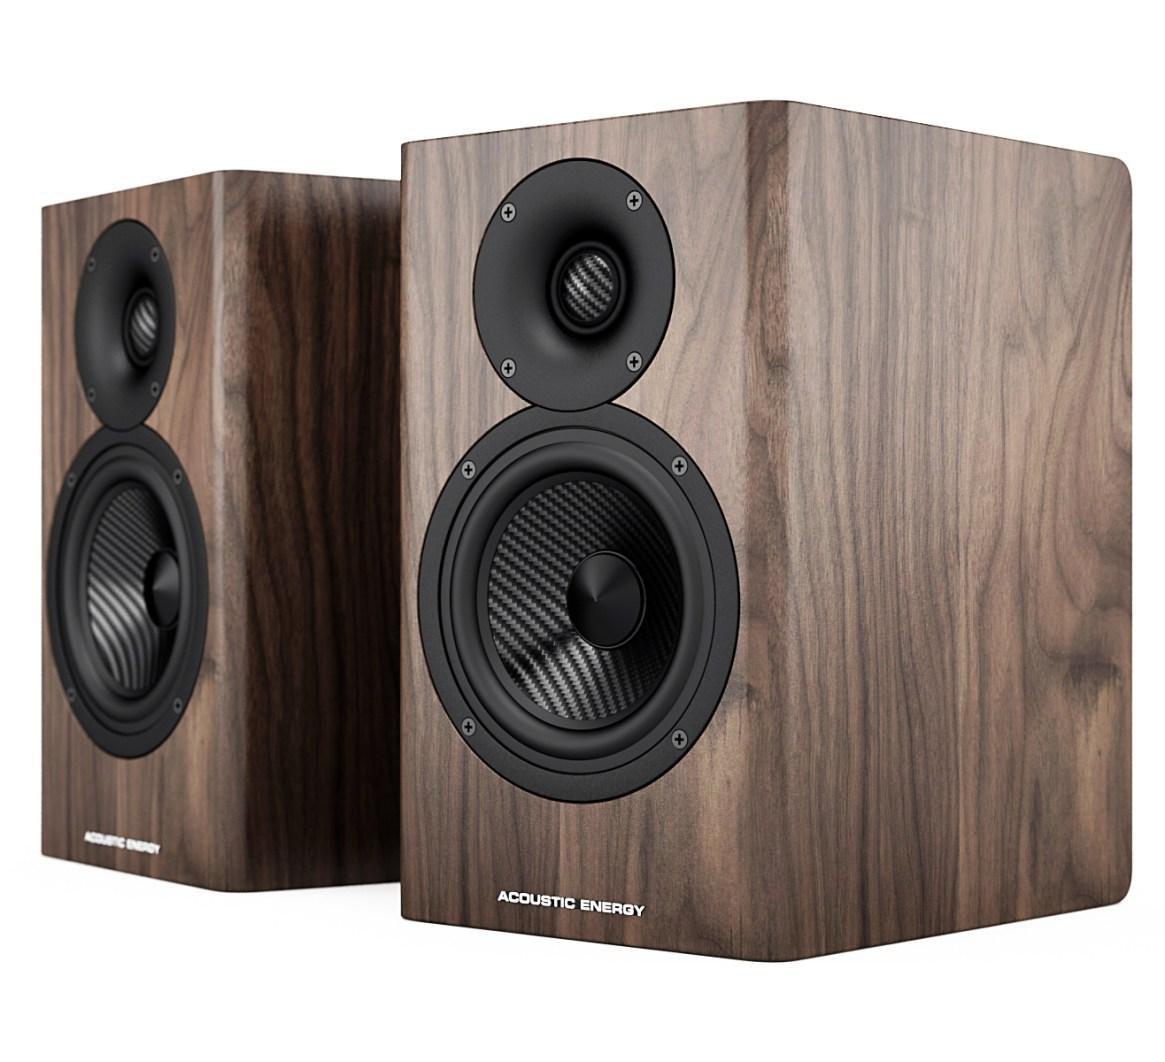 Acoustic Energy AE500